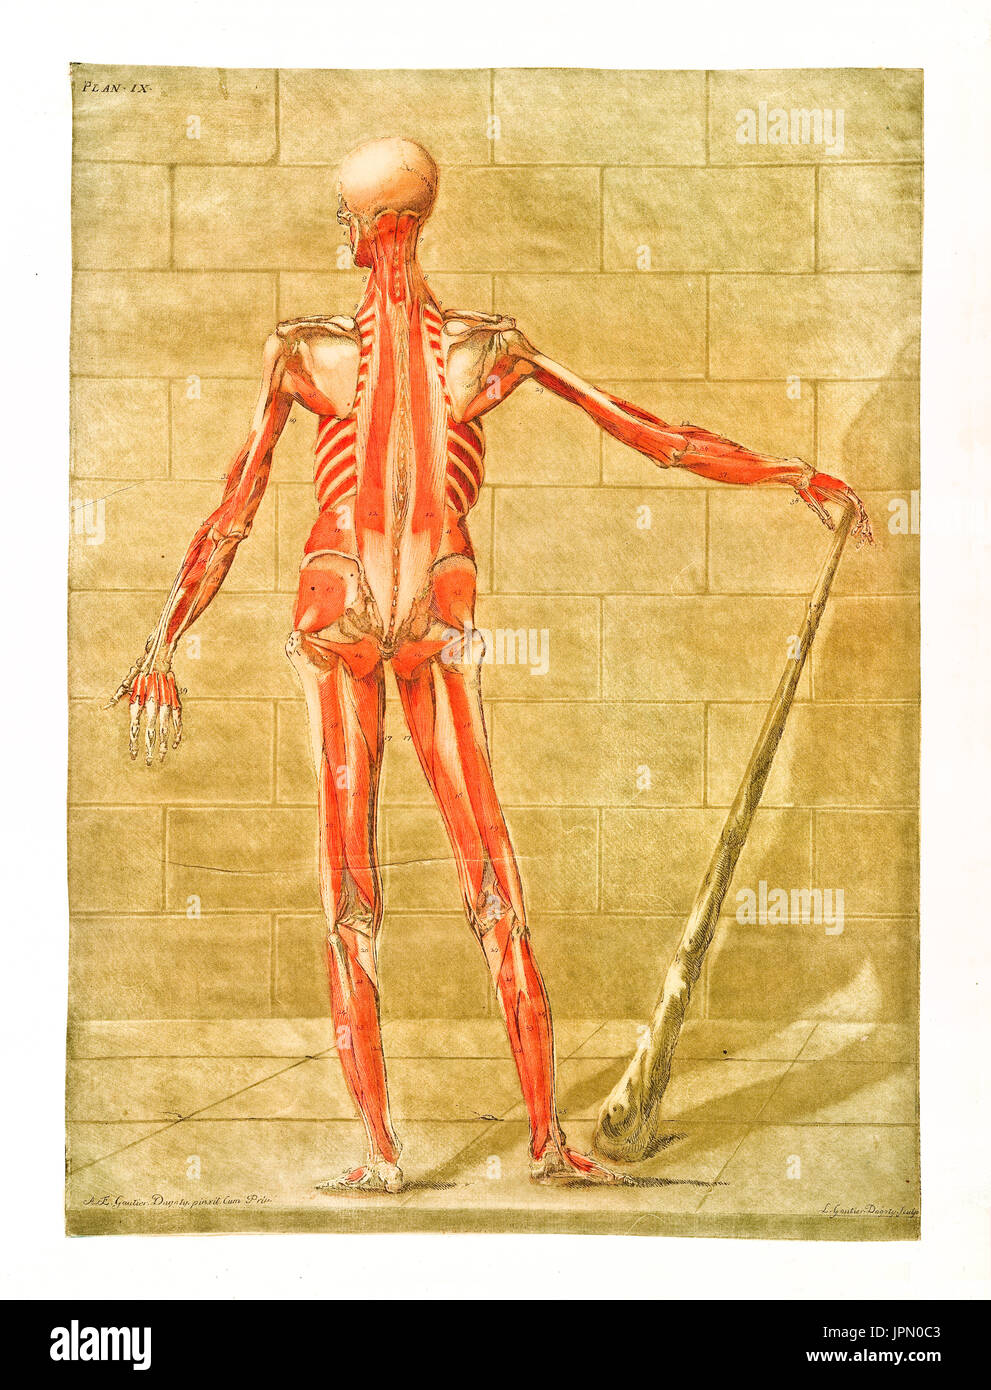 Vintage Engraving Anatomy Human Hand Stock Photos & Vintage ...